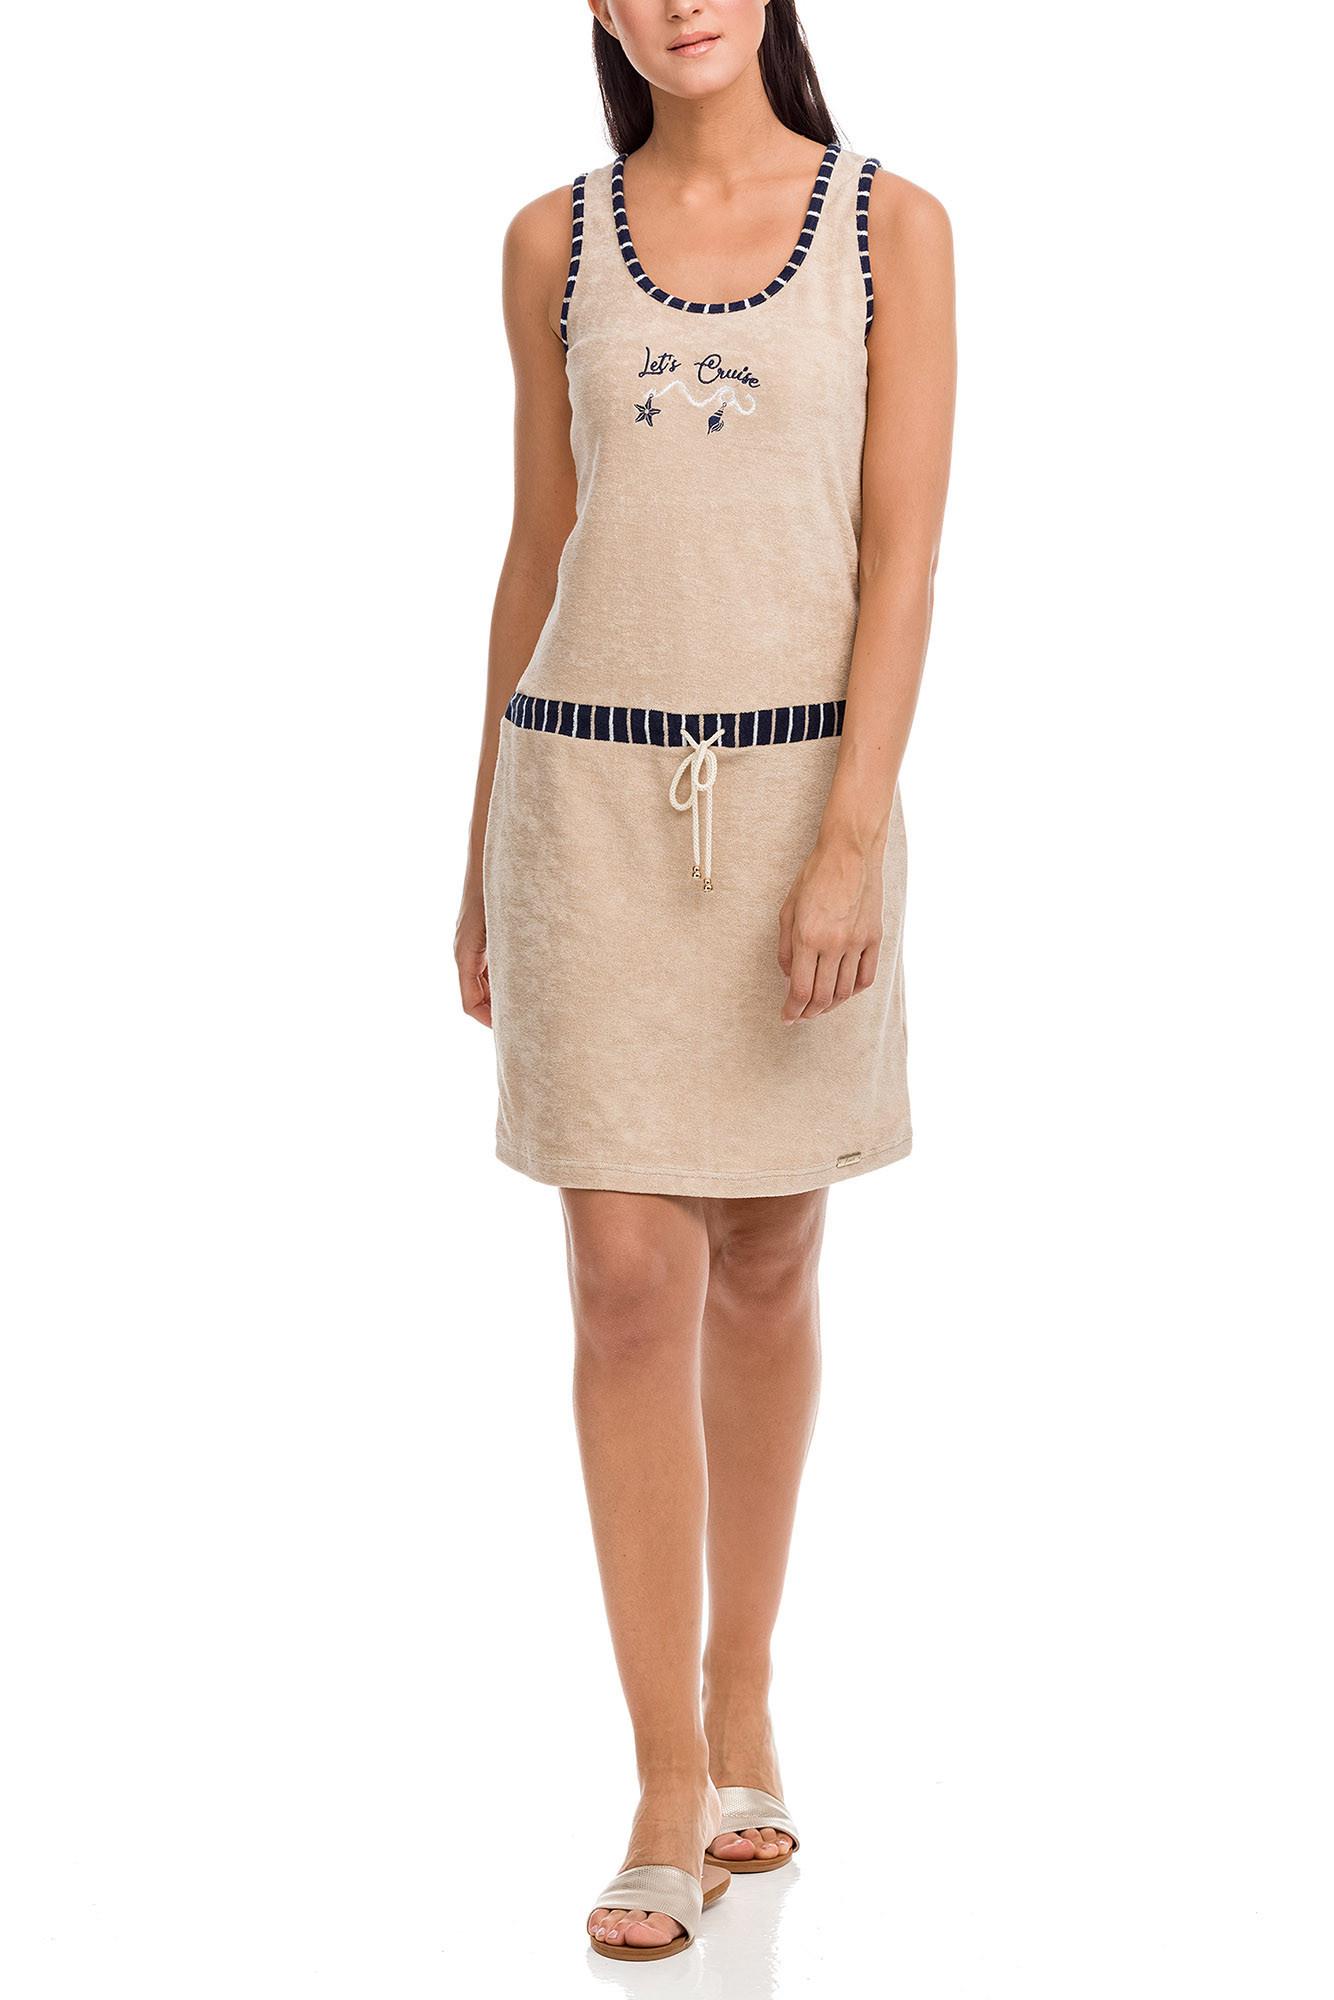 Vamp - Dámske šaty 12578 - Vamp beige peach s